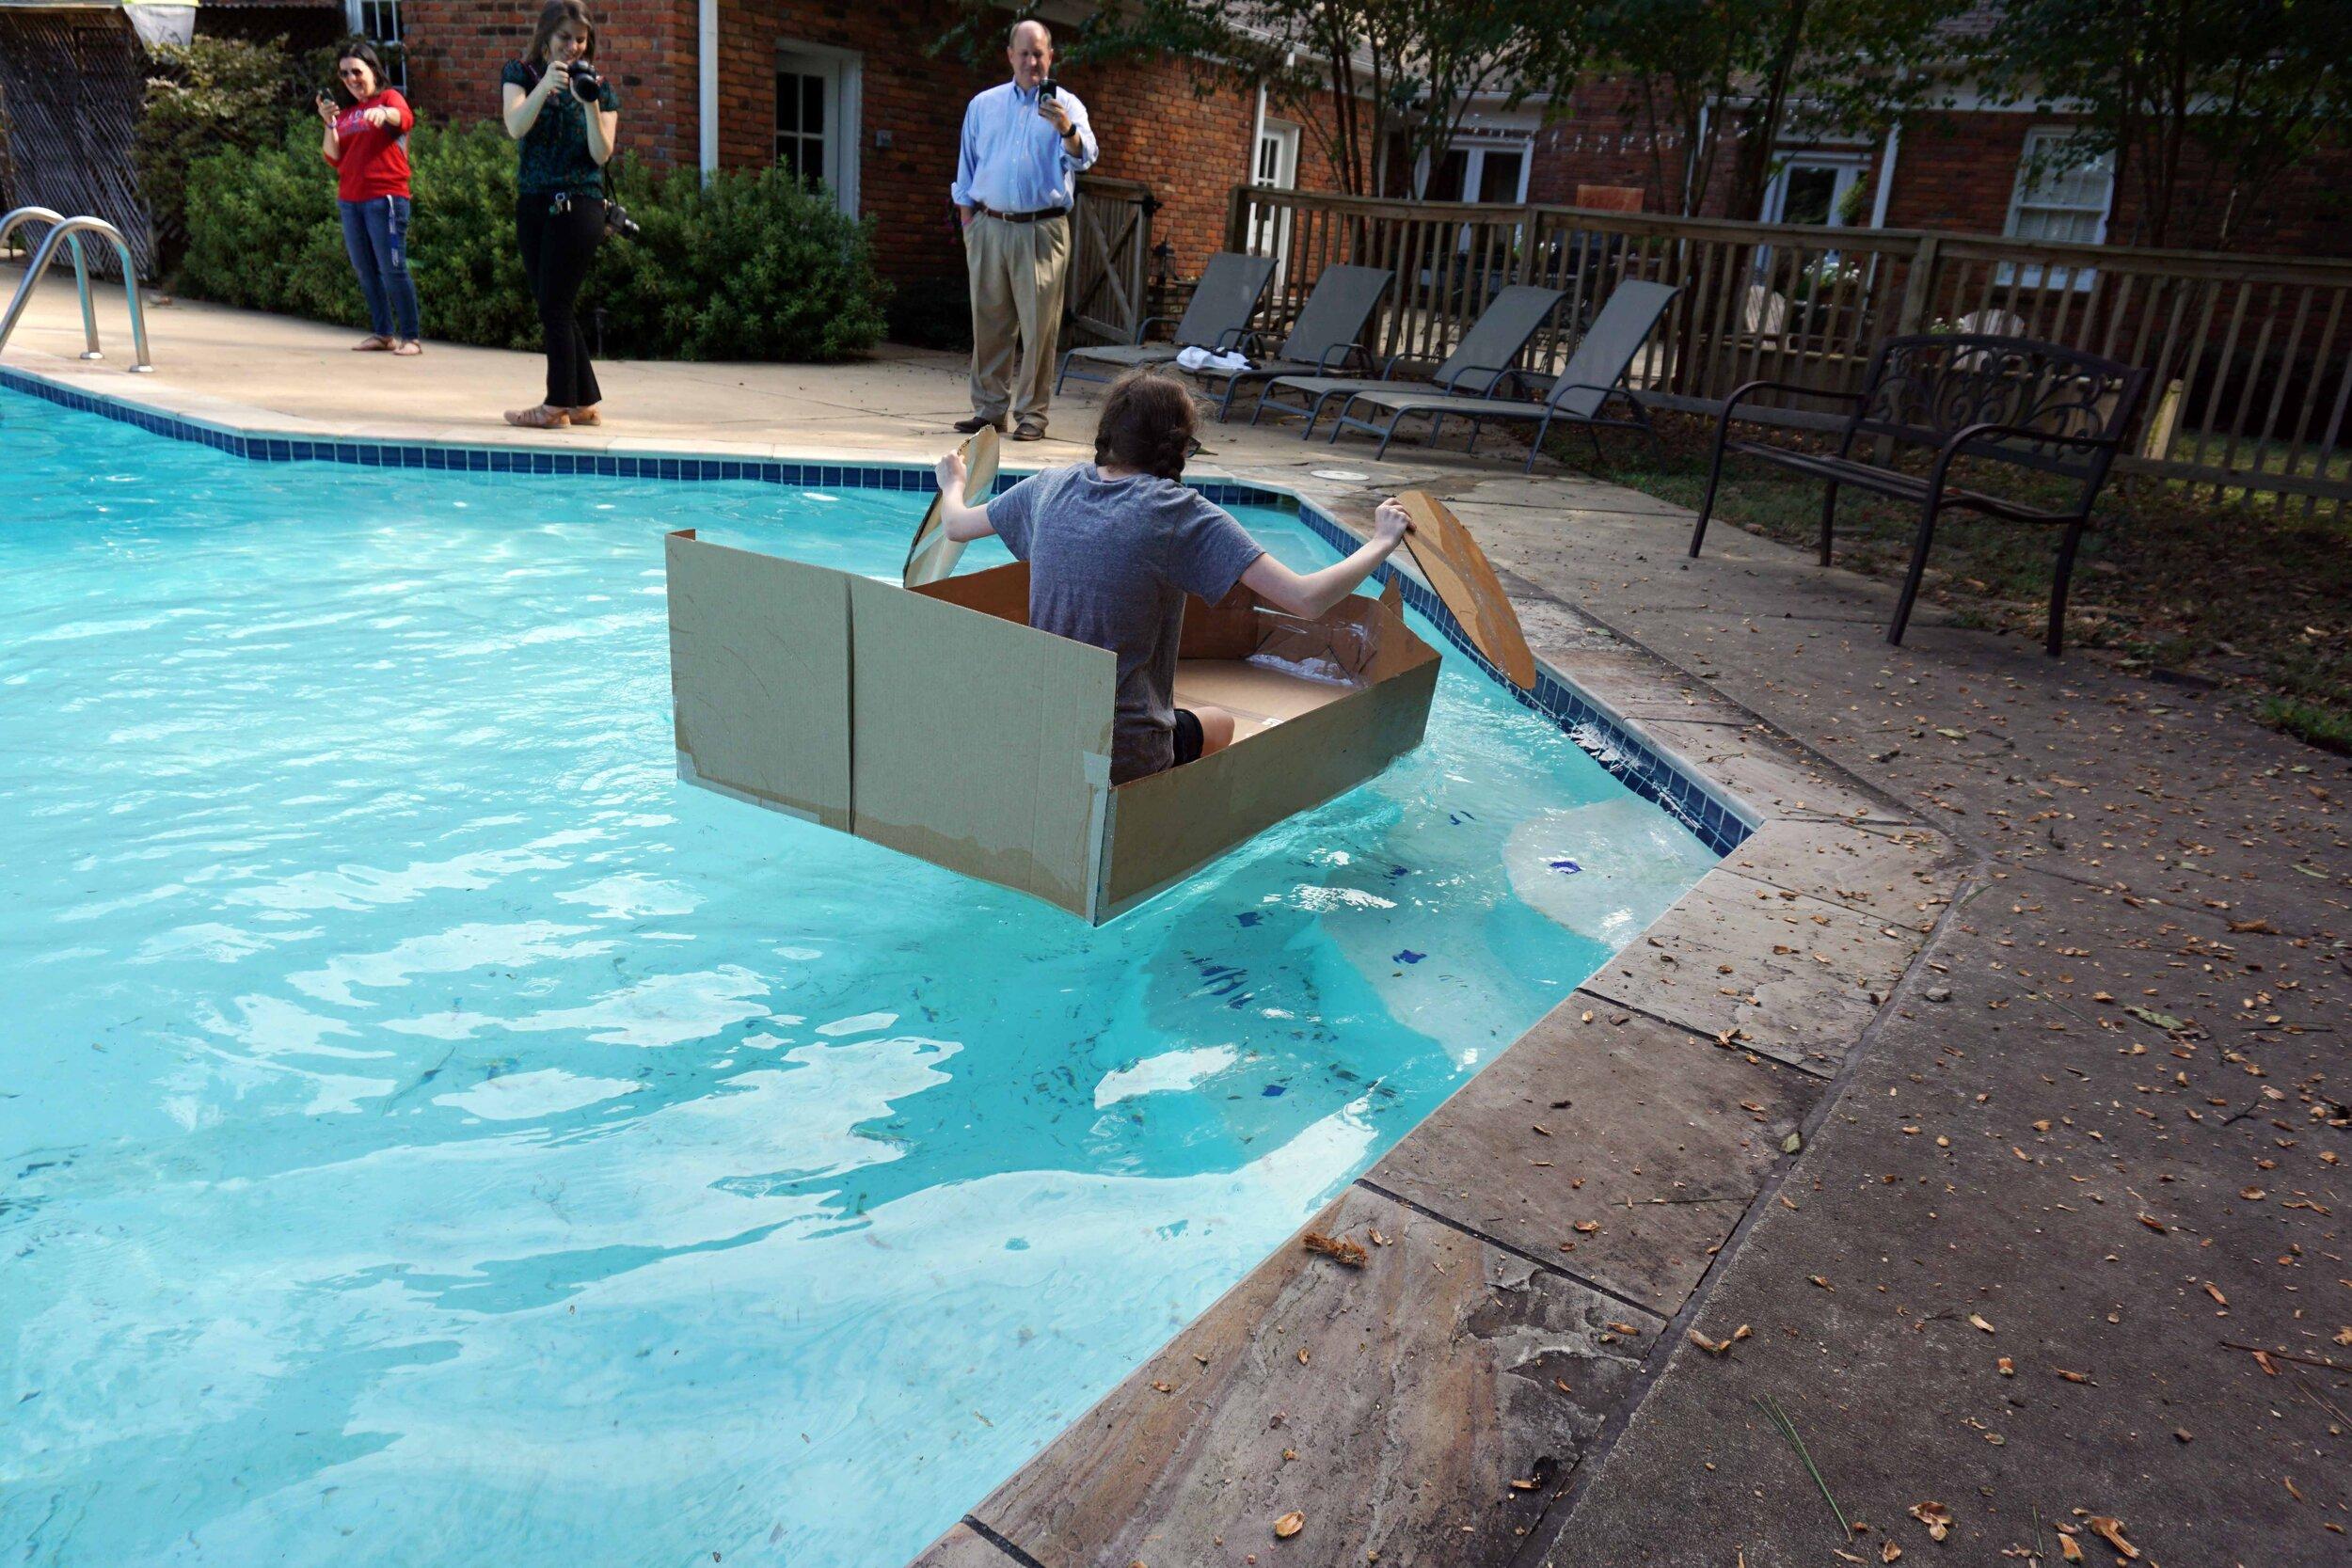 Sept27 DoCardboardBoatsFloat09.jpg